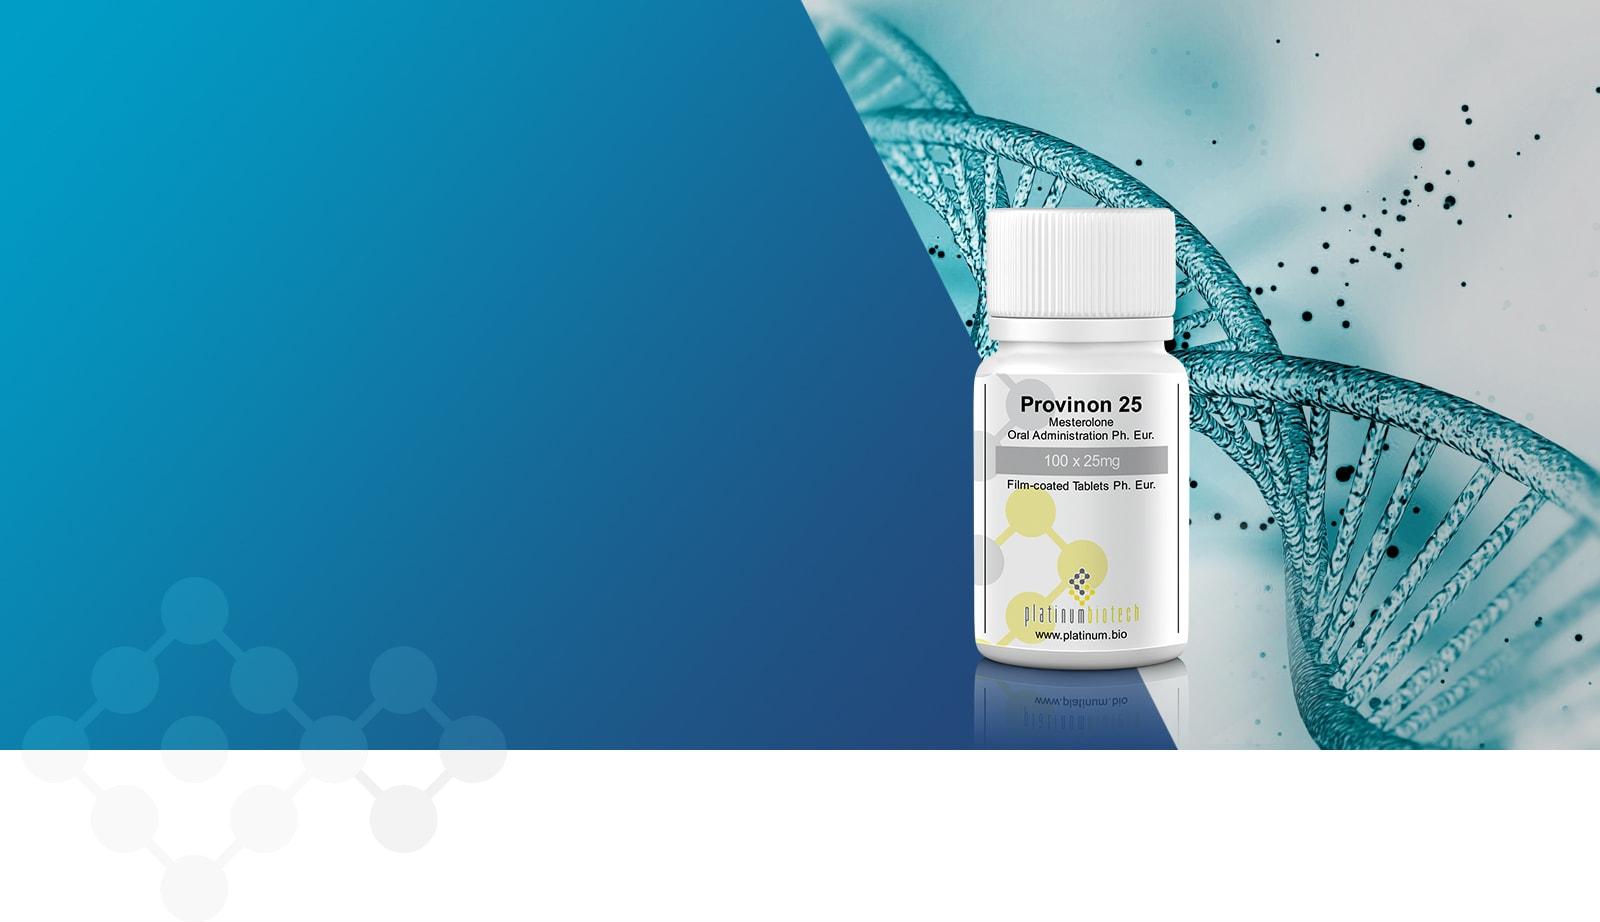 Platinum Biotech